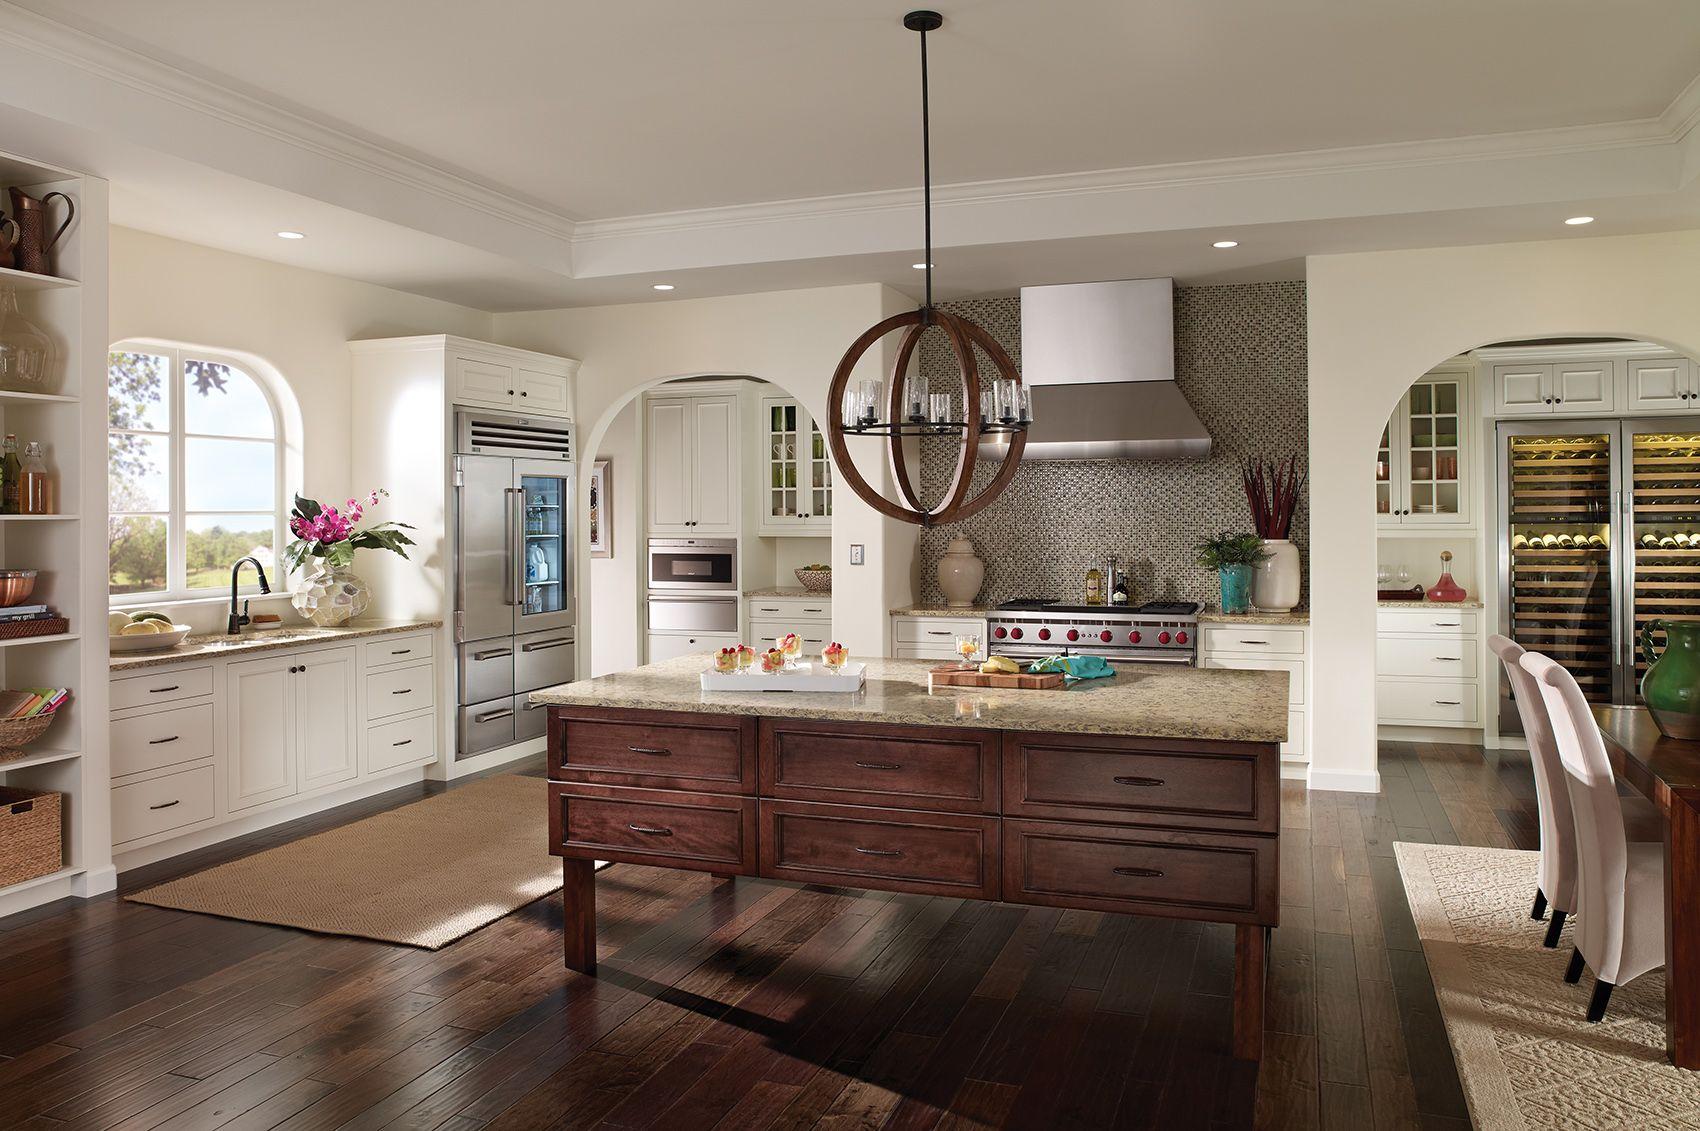 Pin By Continental Kitchen And Bath S On Modern Kitchens Custom Kitchen Cabinets Kitchen Design Bertch Cabinets